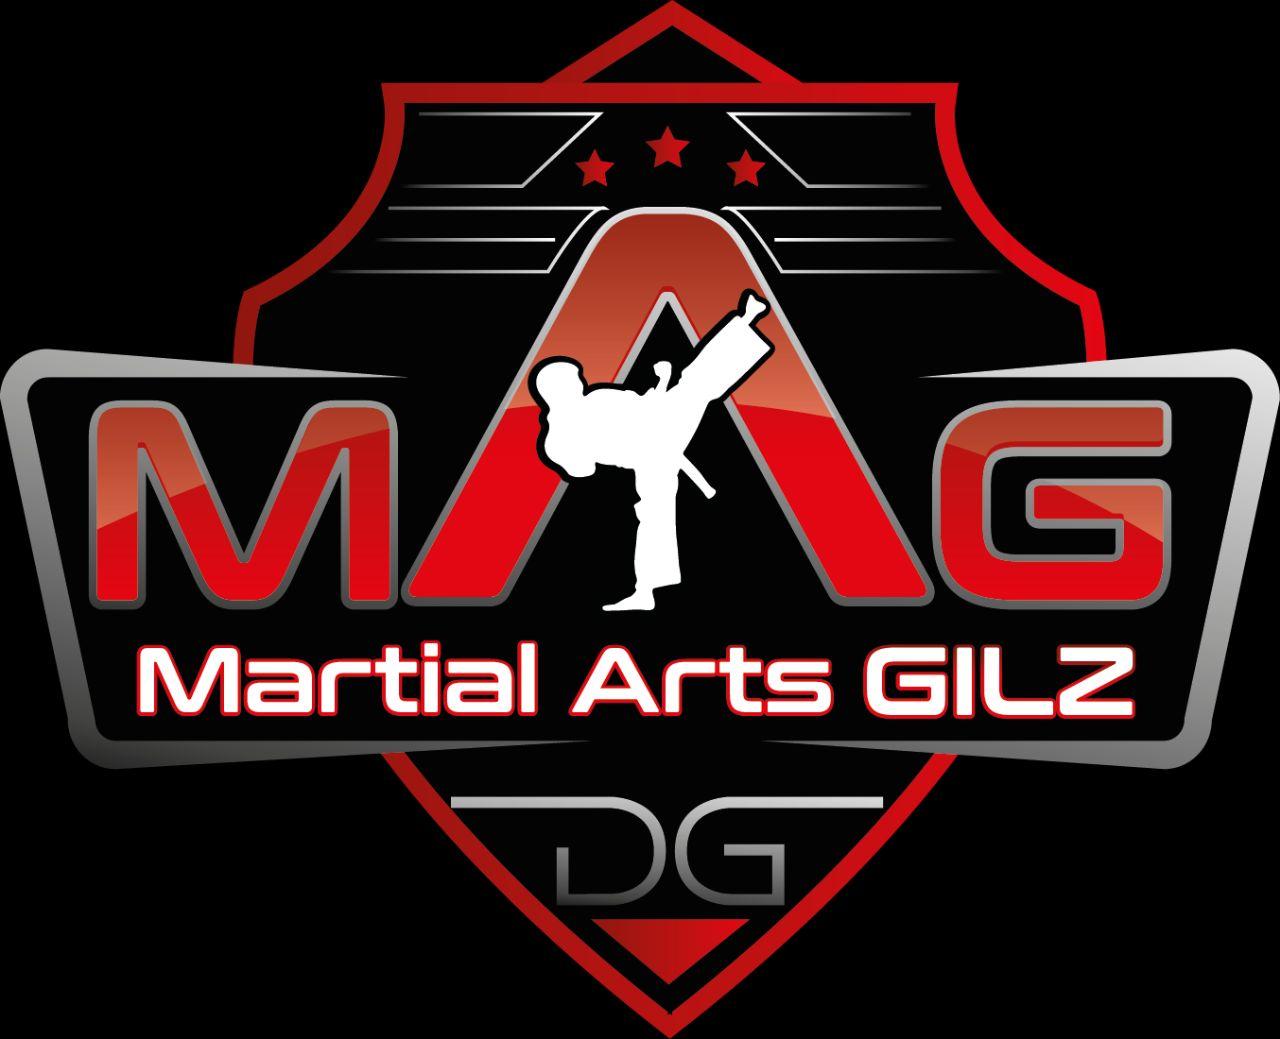 martial-arts-gilz.de